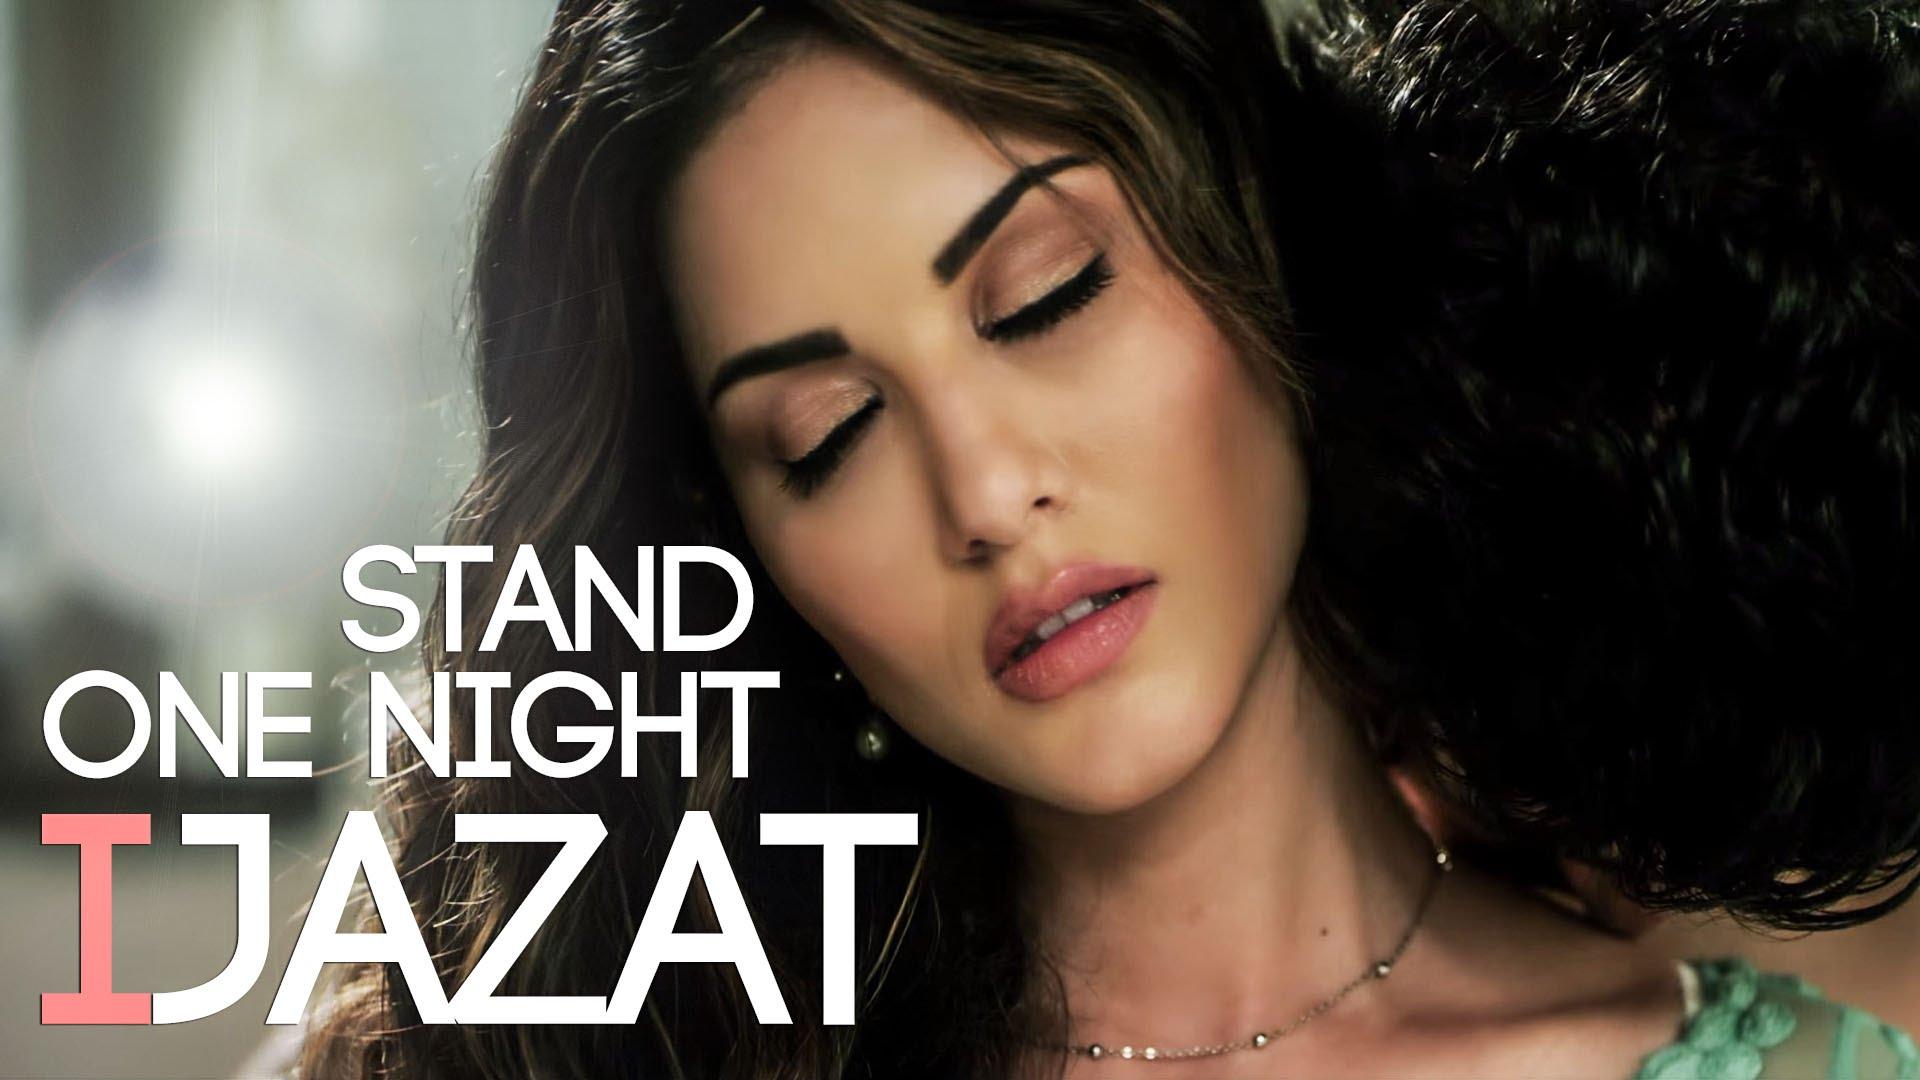 Ijazat Lyrics & HD Video – Arijit Singh Feat. Sunny Leone